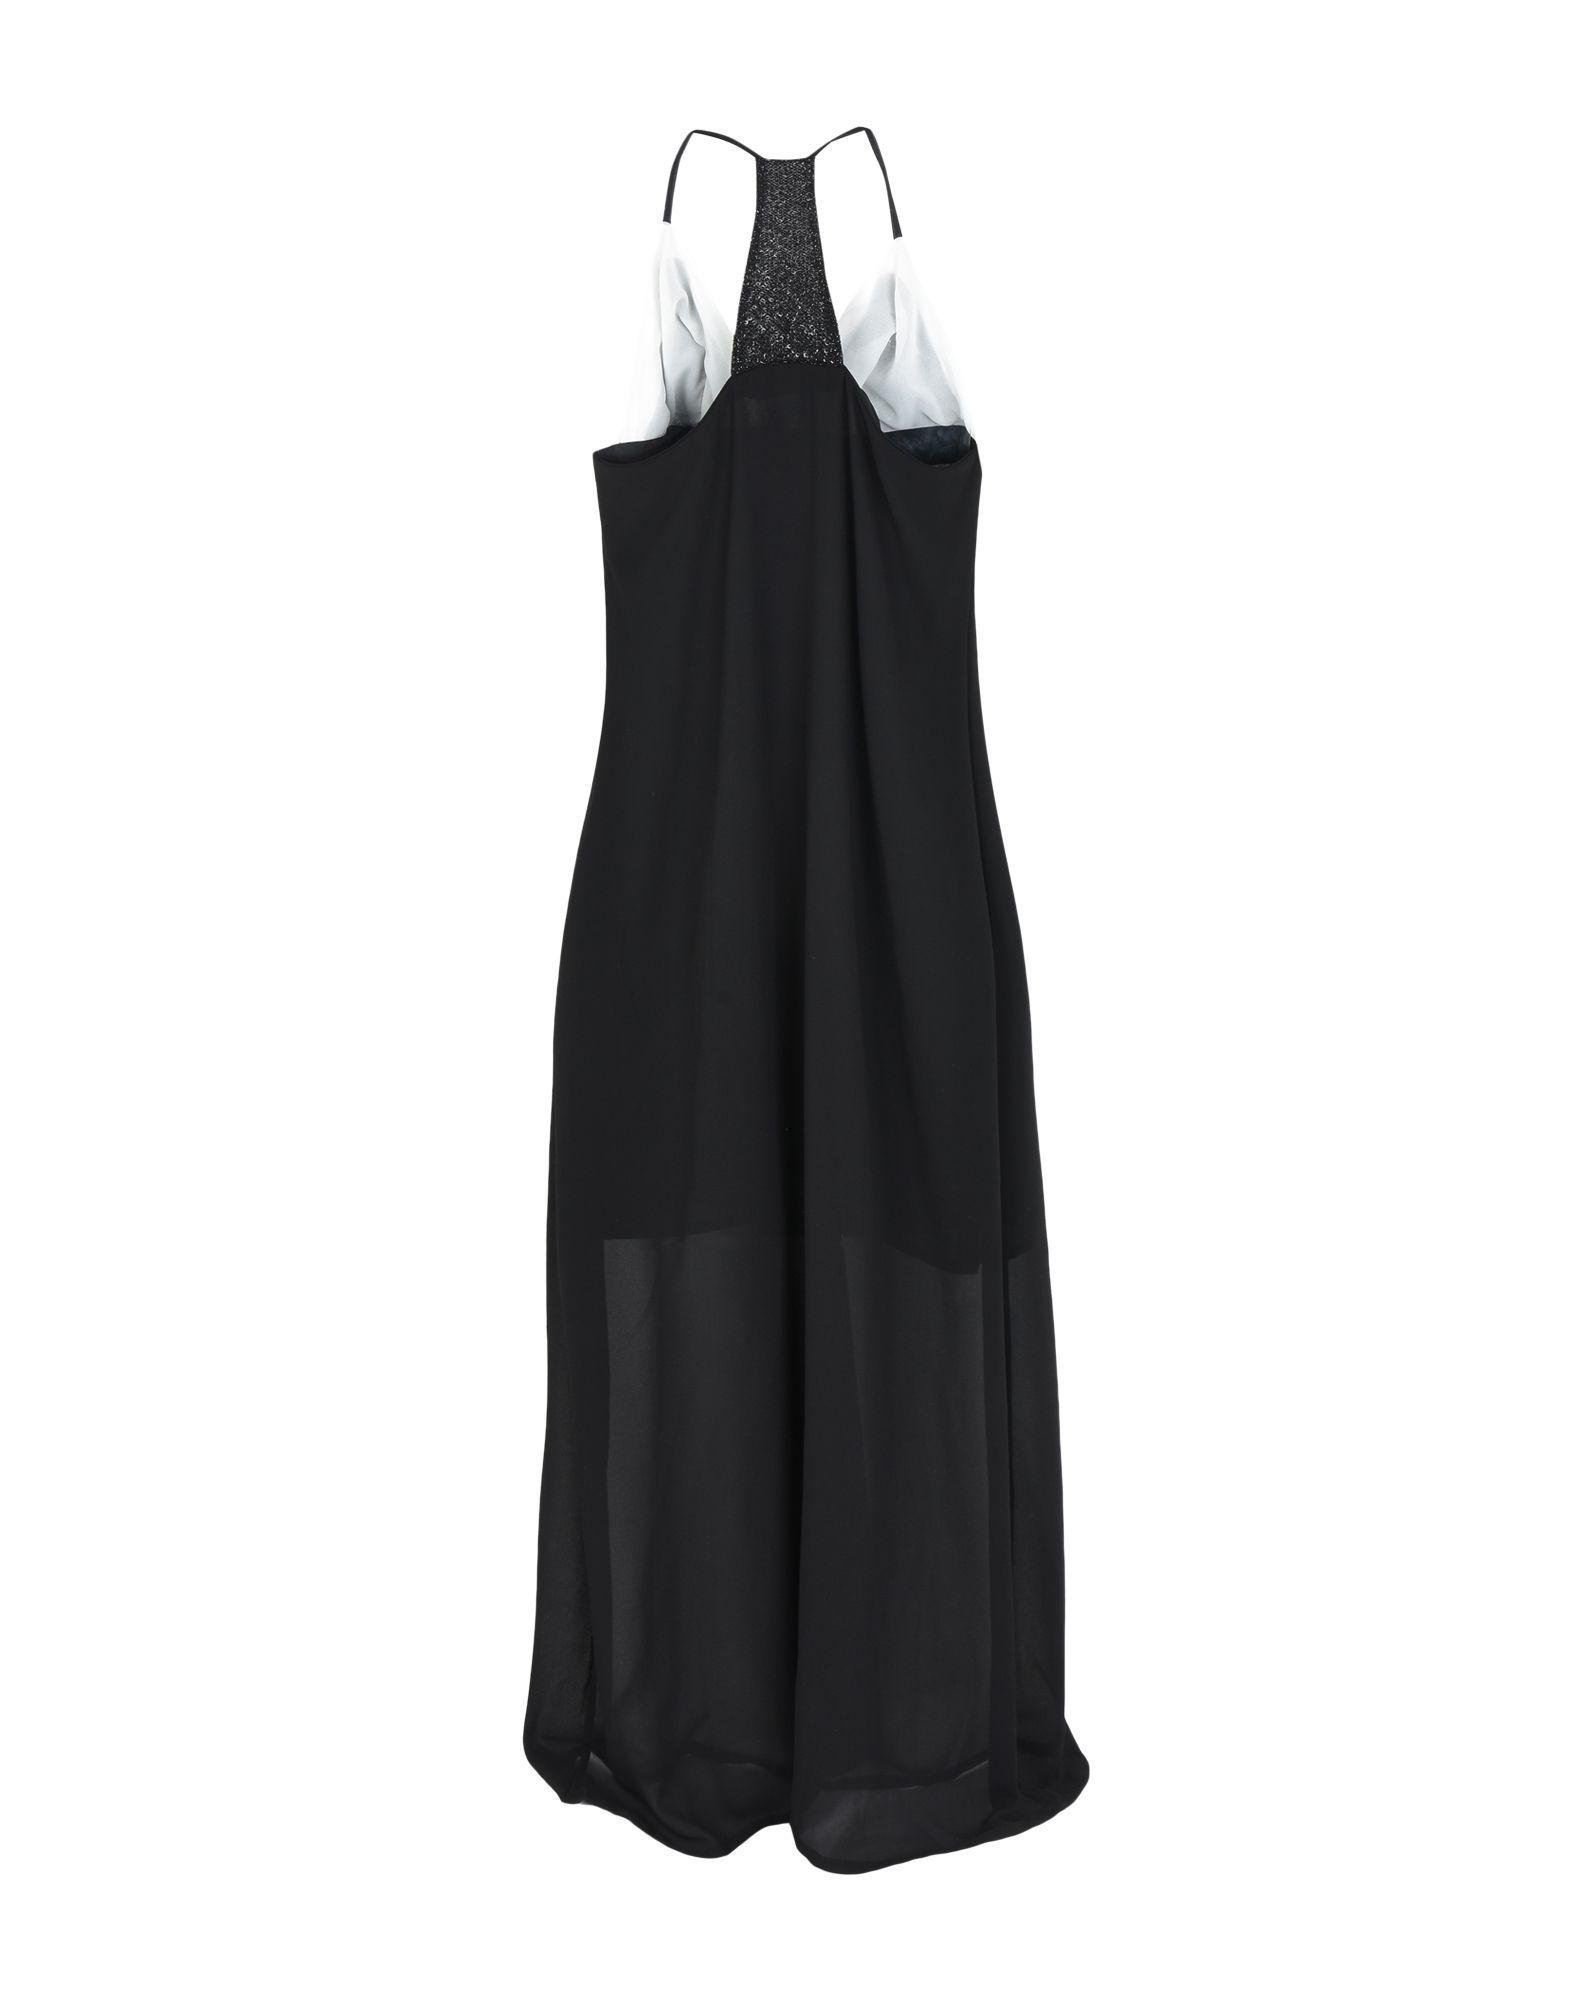 Christies Black Crepe Plunge Neckline Dress